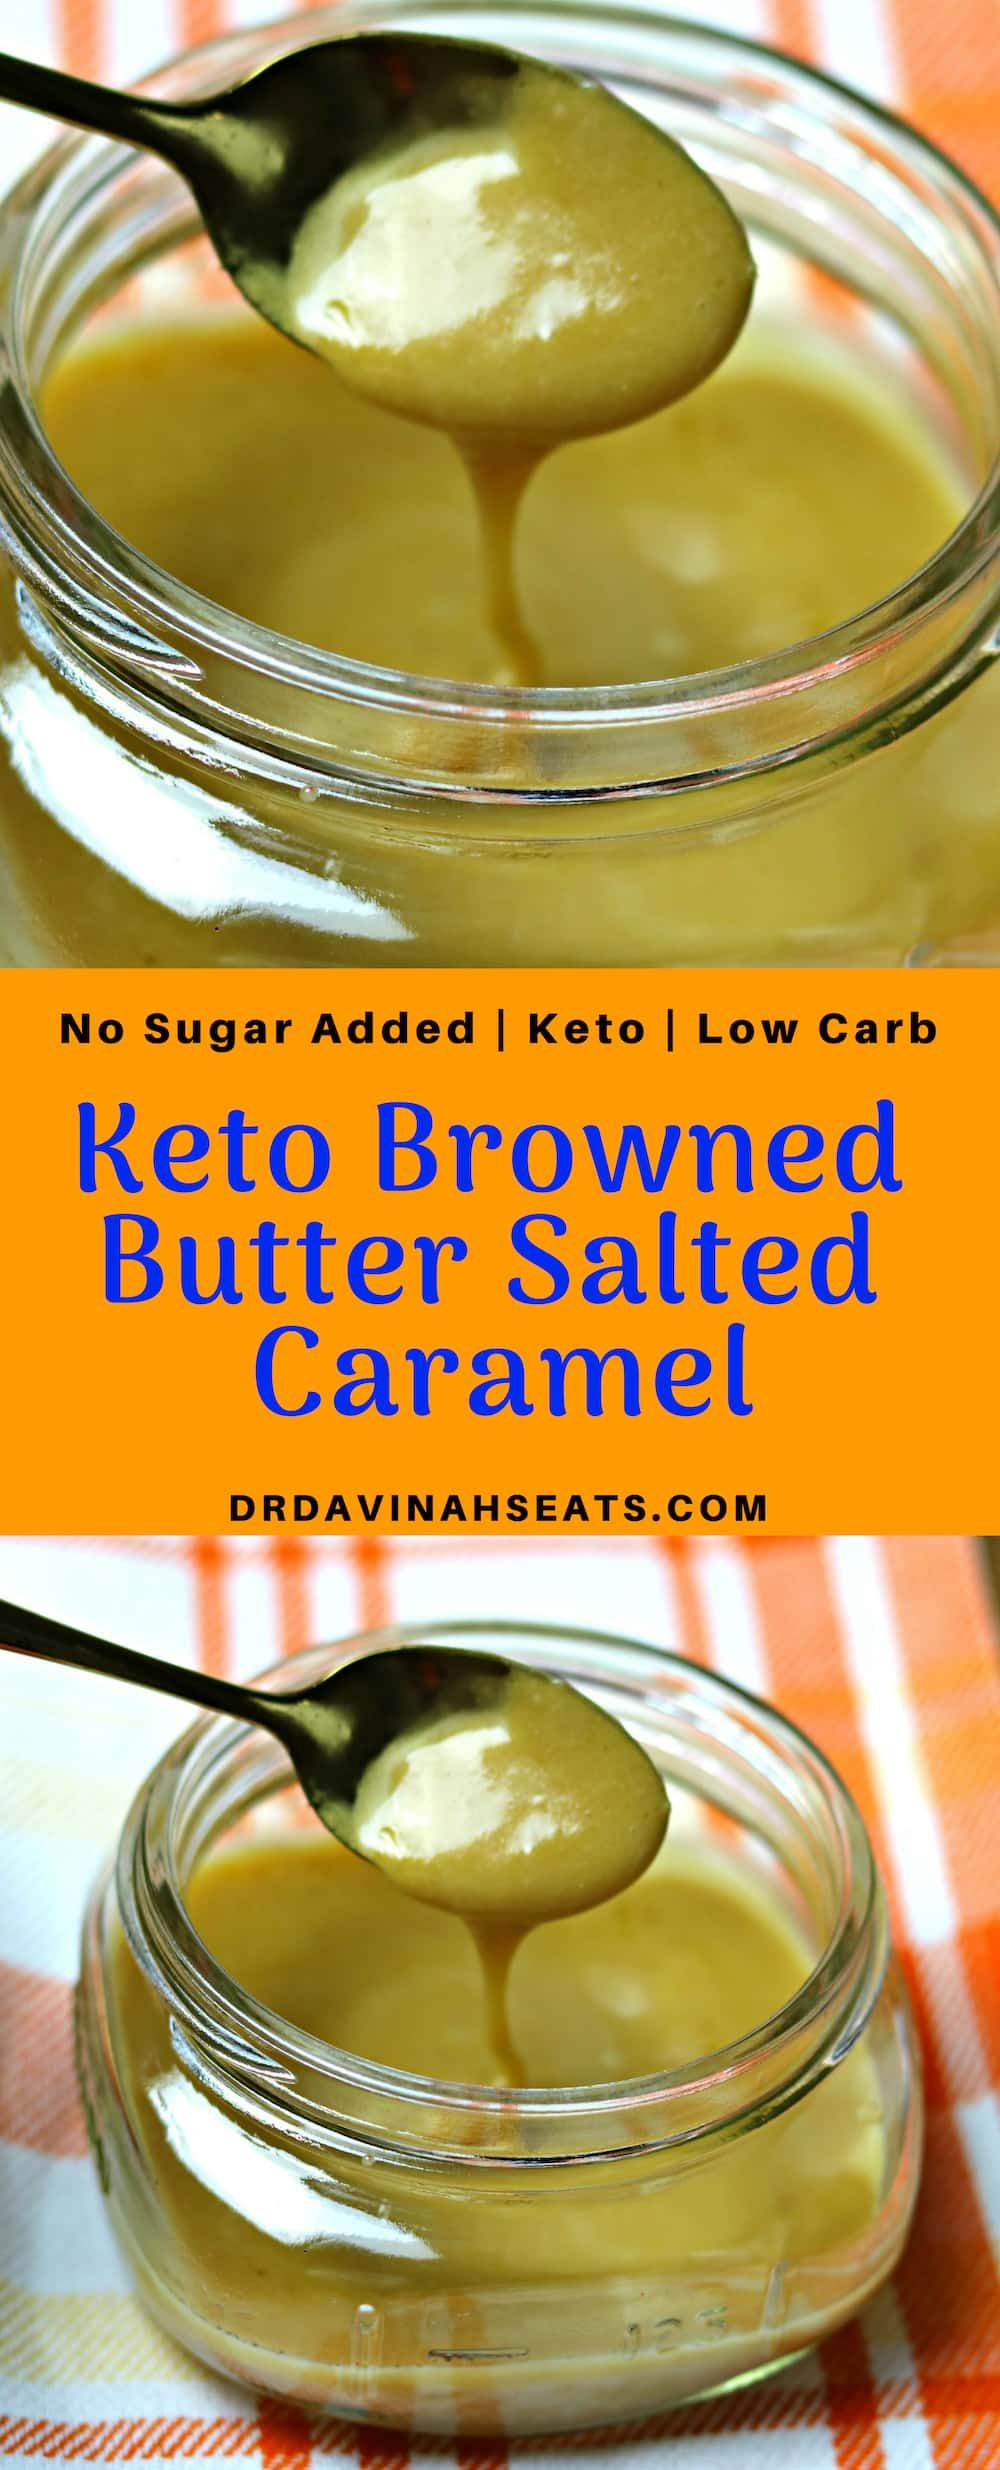 Keto brown butter salted caramel recipe no sugar added